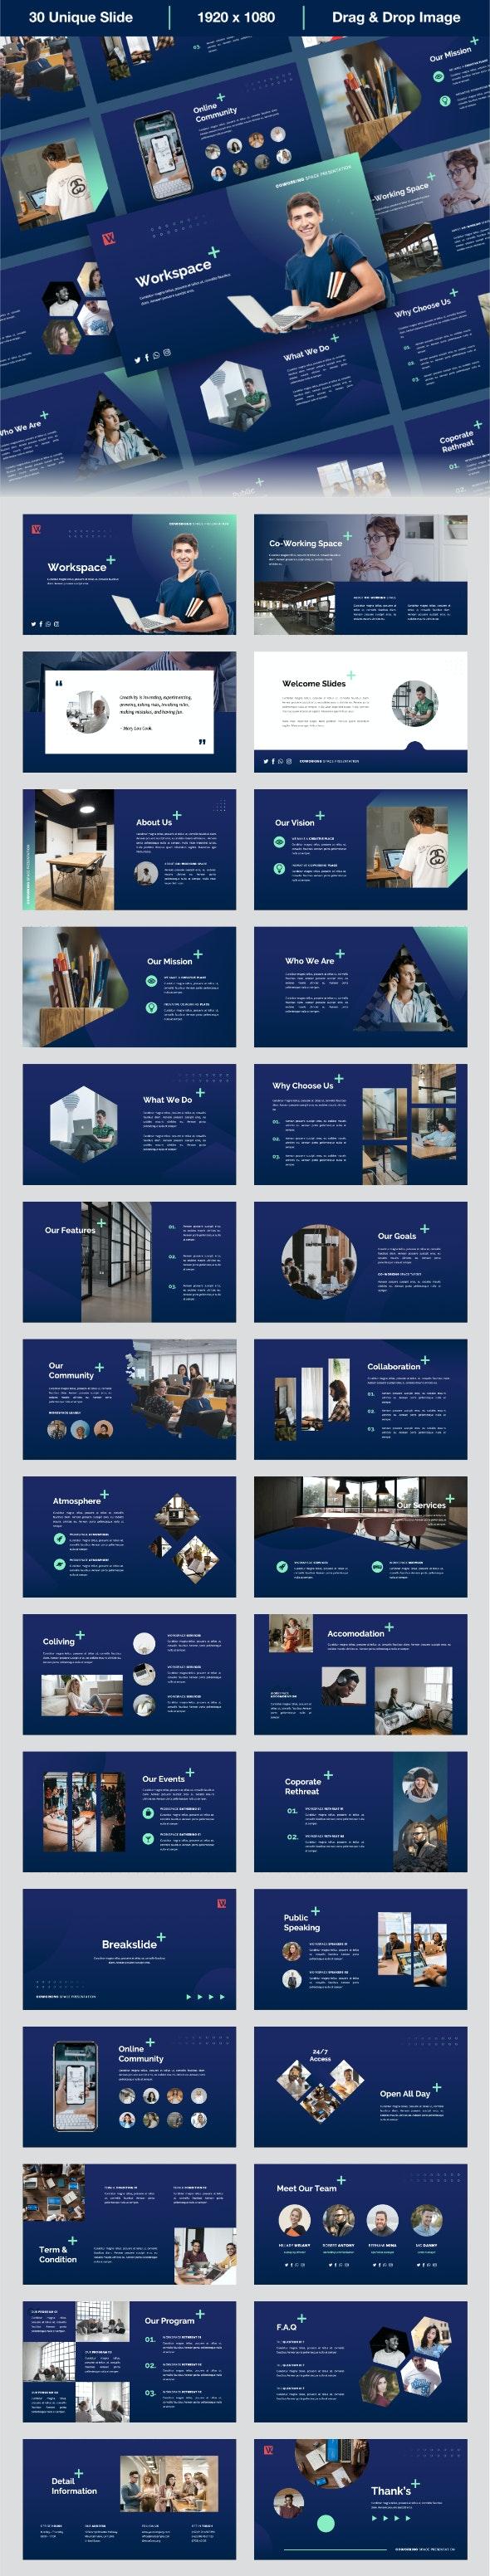 Workspace - Coworking Space Keynote Presentation Templates - Business Keynote Templates